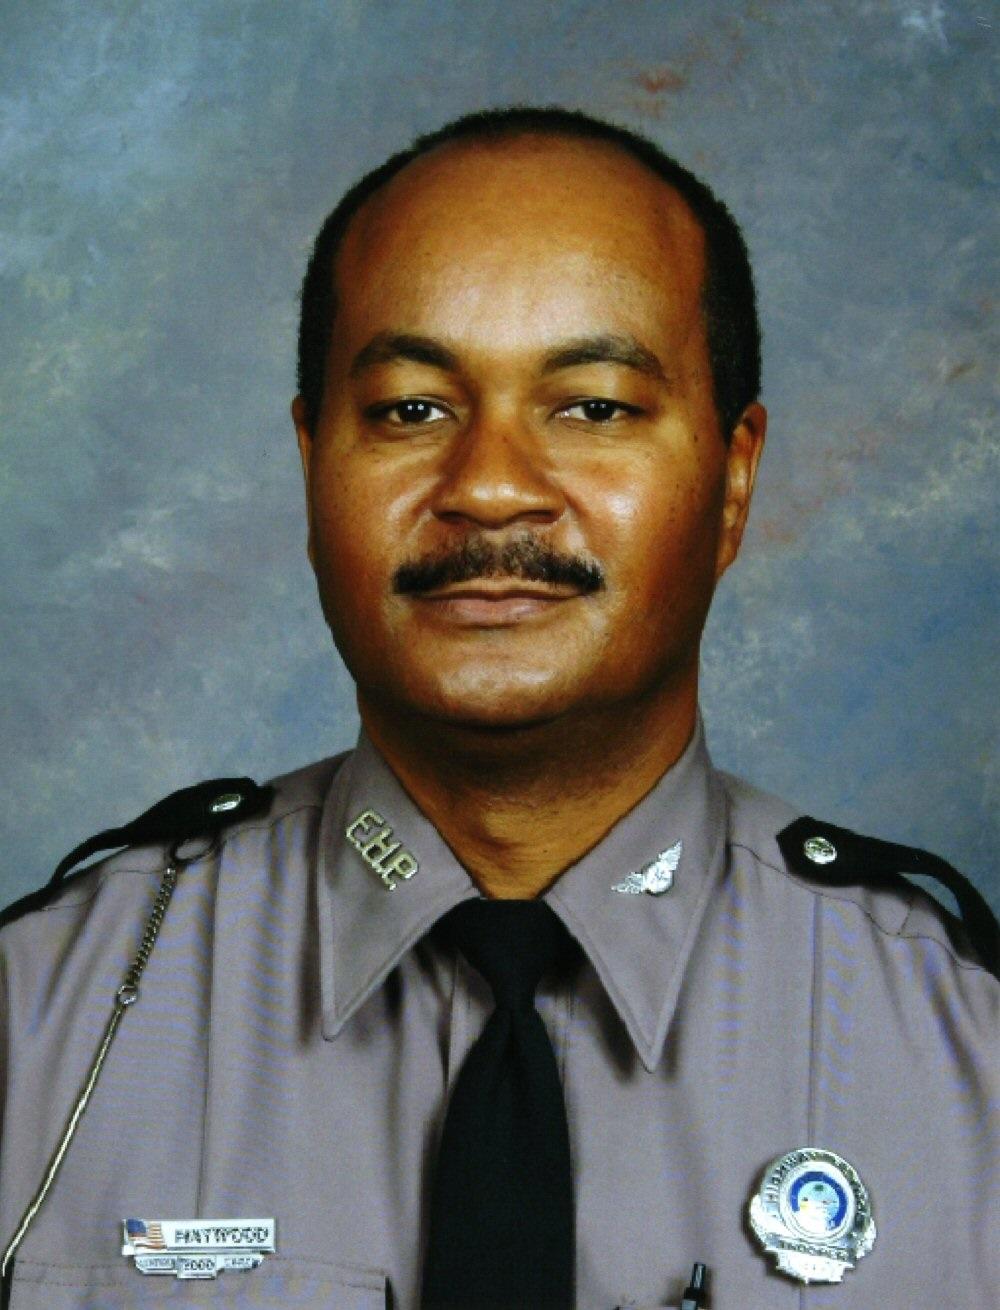 Trooper Darryl Louis Haywood, Sr. | Florida Highway Patrol, Florida